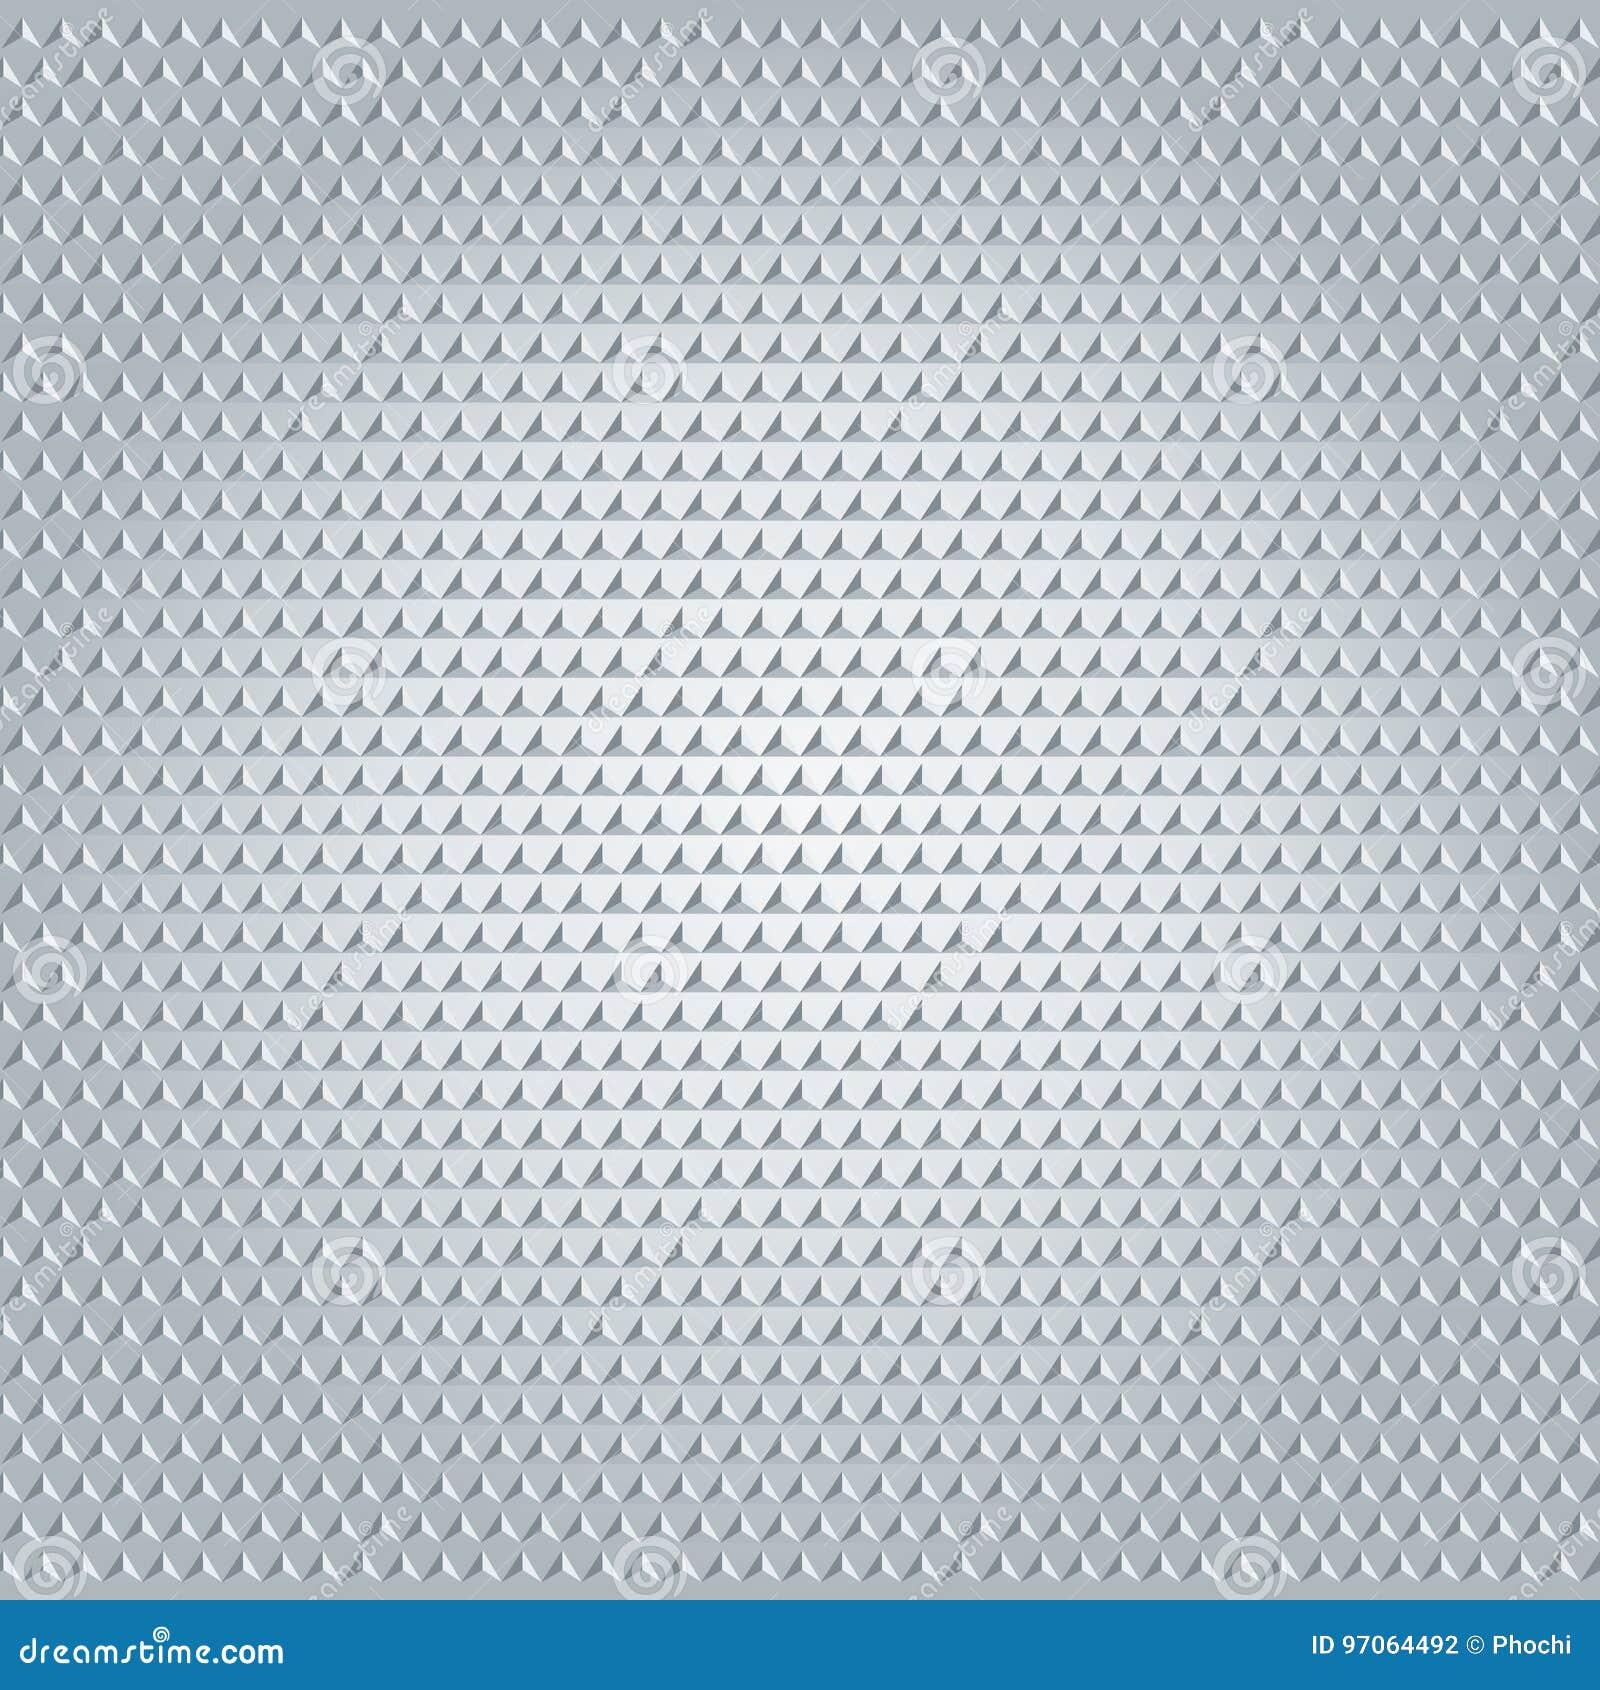 3d Geometric Pattern, Triangular Pyramid, Vector Background Stock ...